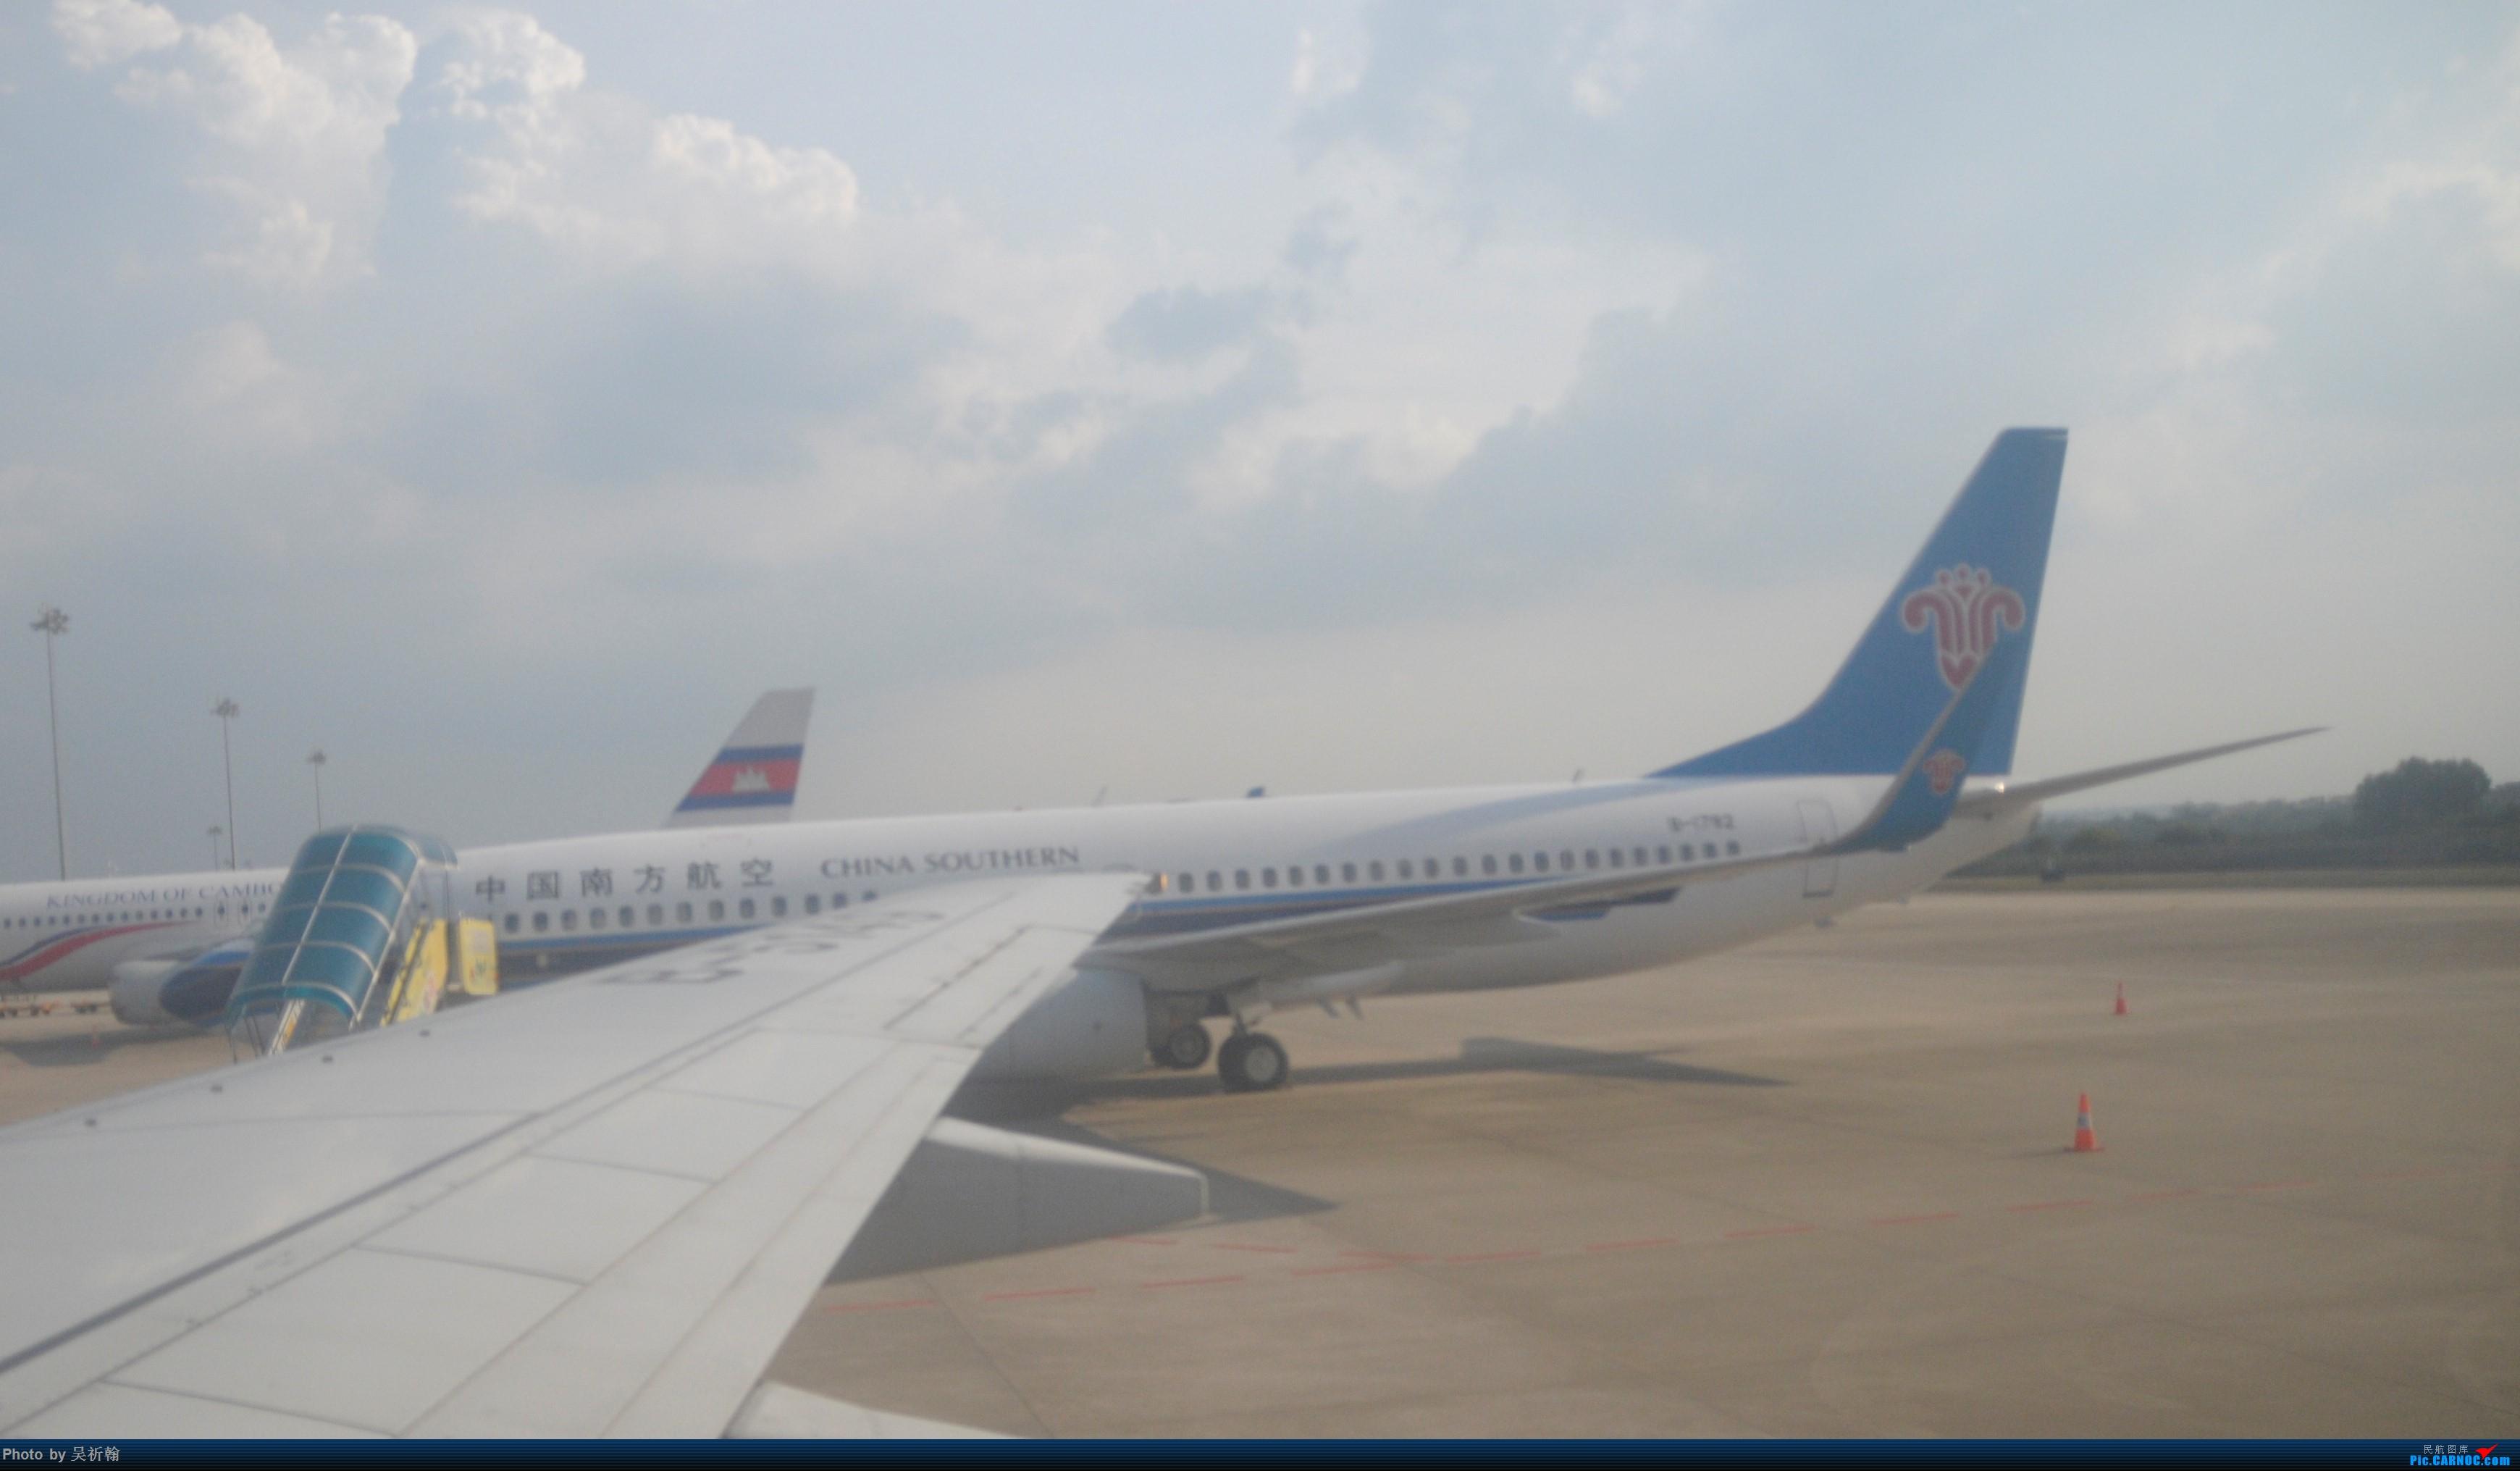 Re:[原创]Kian的飞行游记1:飞往无锡 BOEING 737-800 B-1782